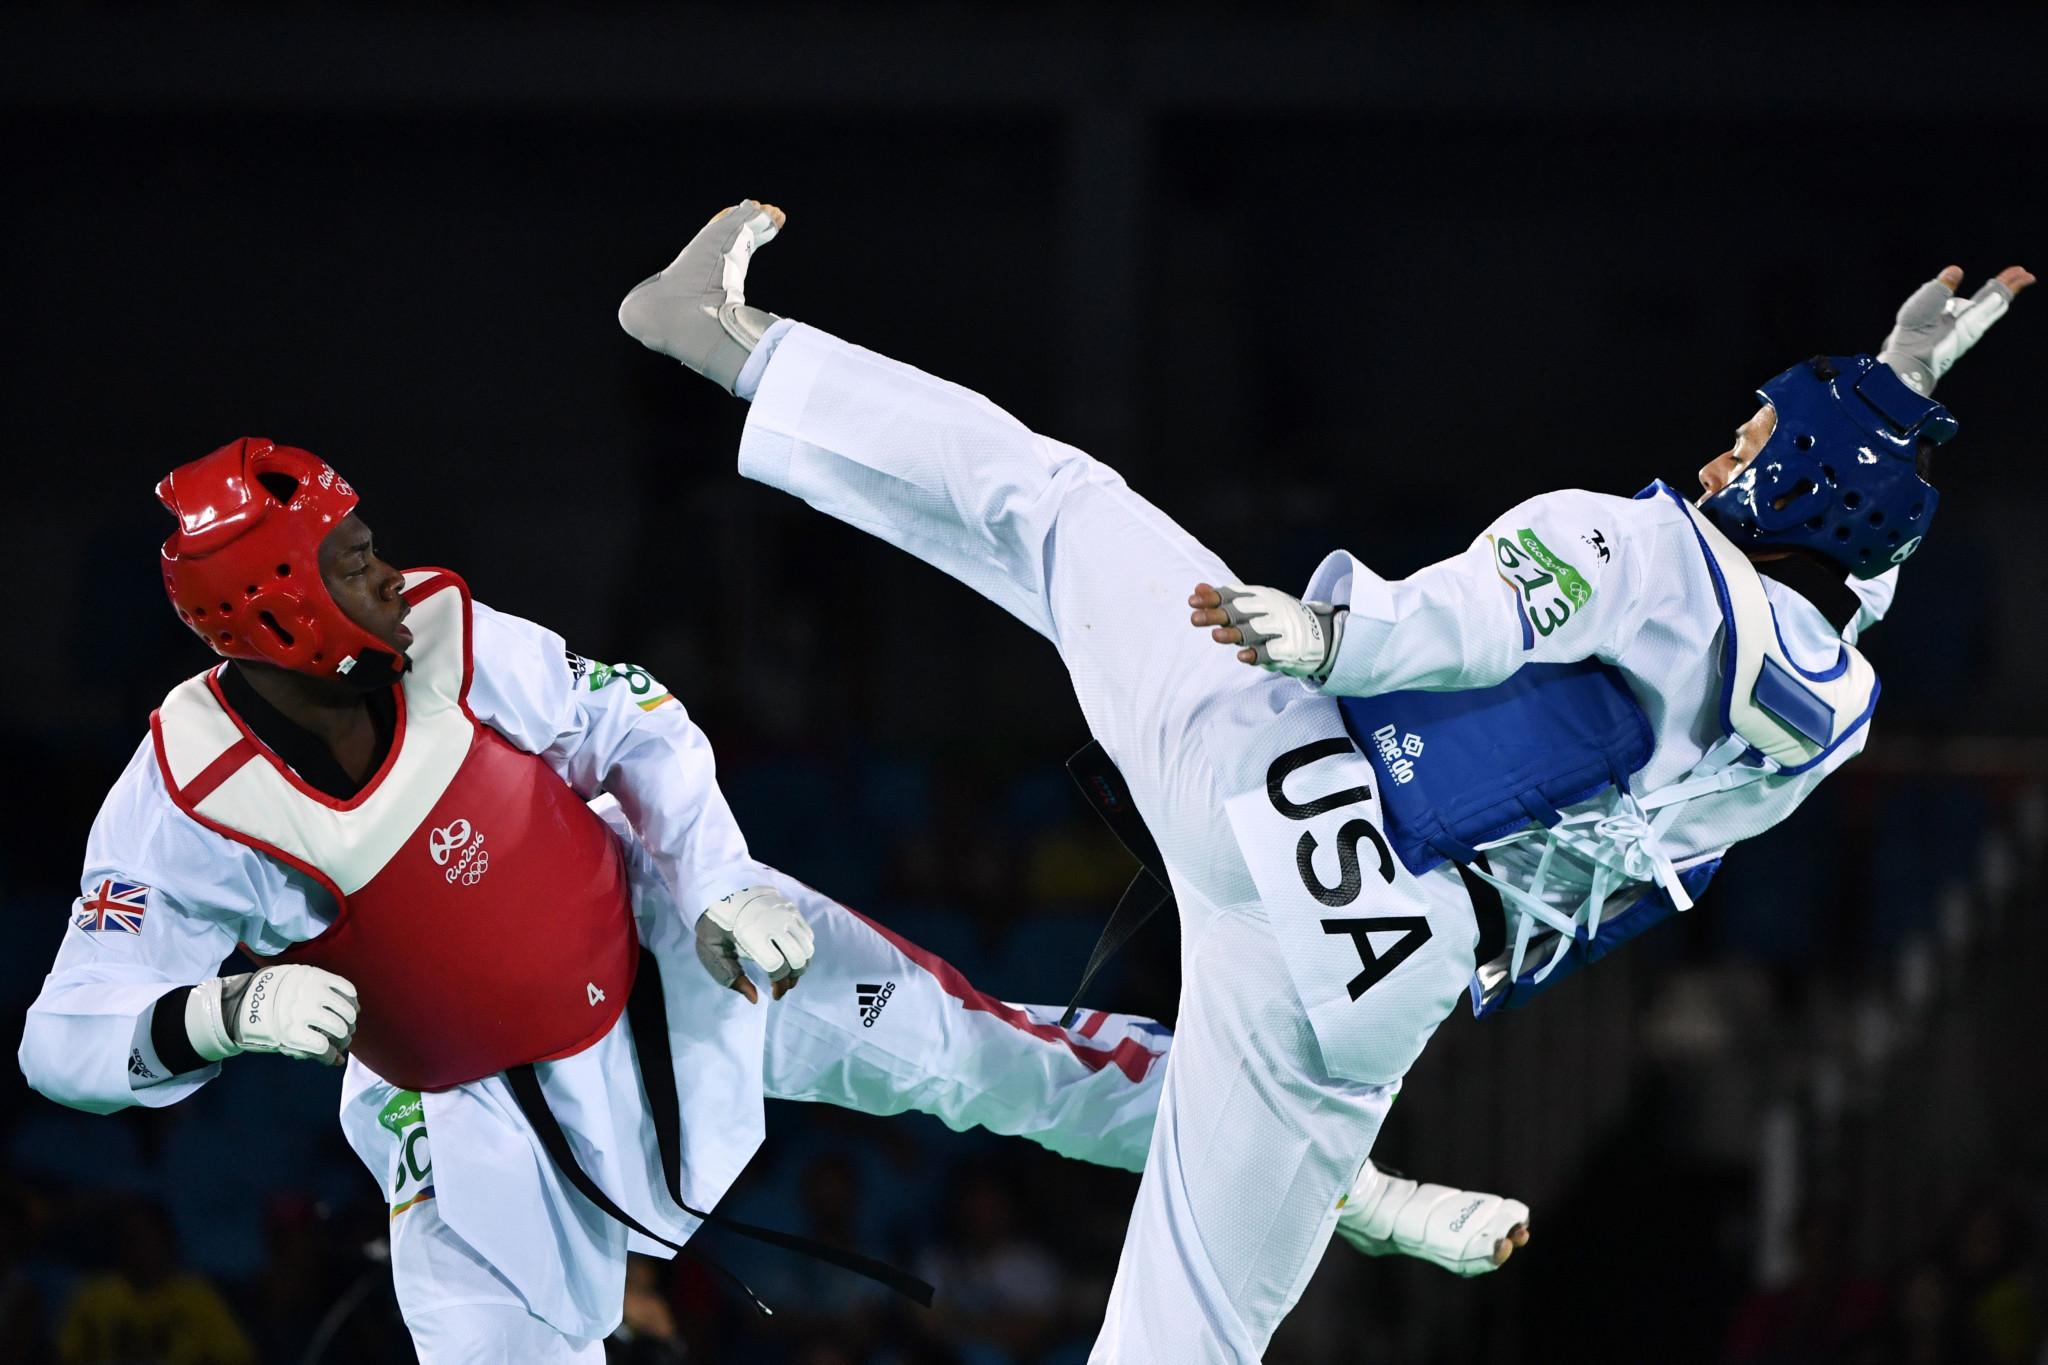 USA Taekwondo coach Laurin selected for IOC coaching programme